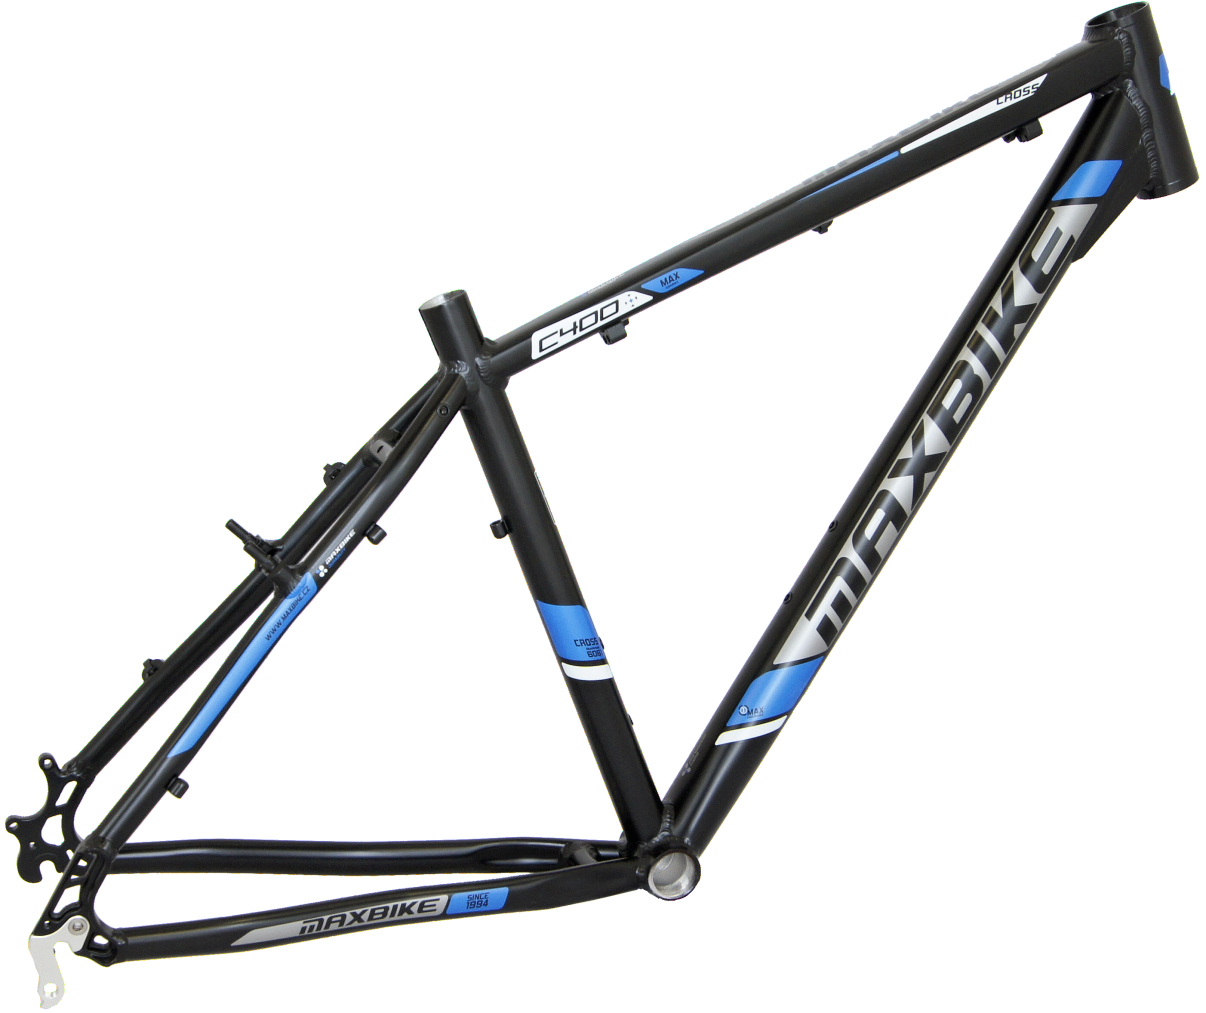 "rám Maxbike C400 16"" černý mat + modrá"